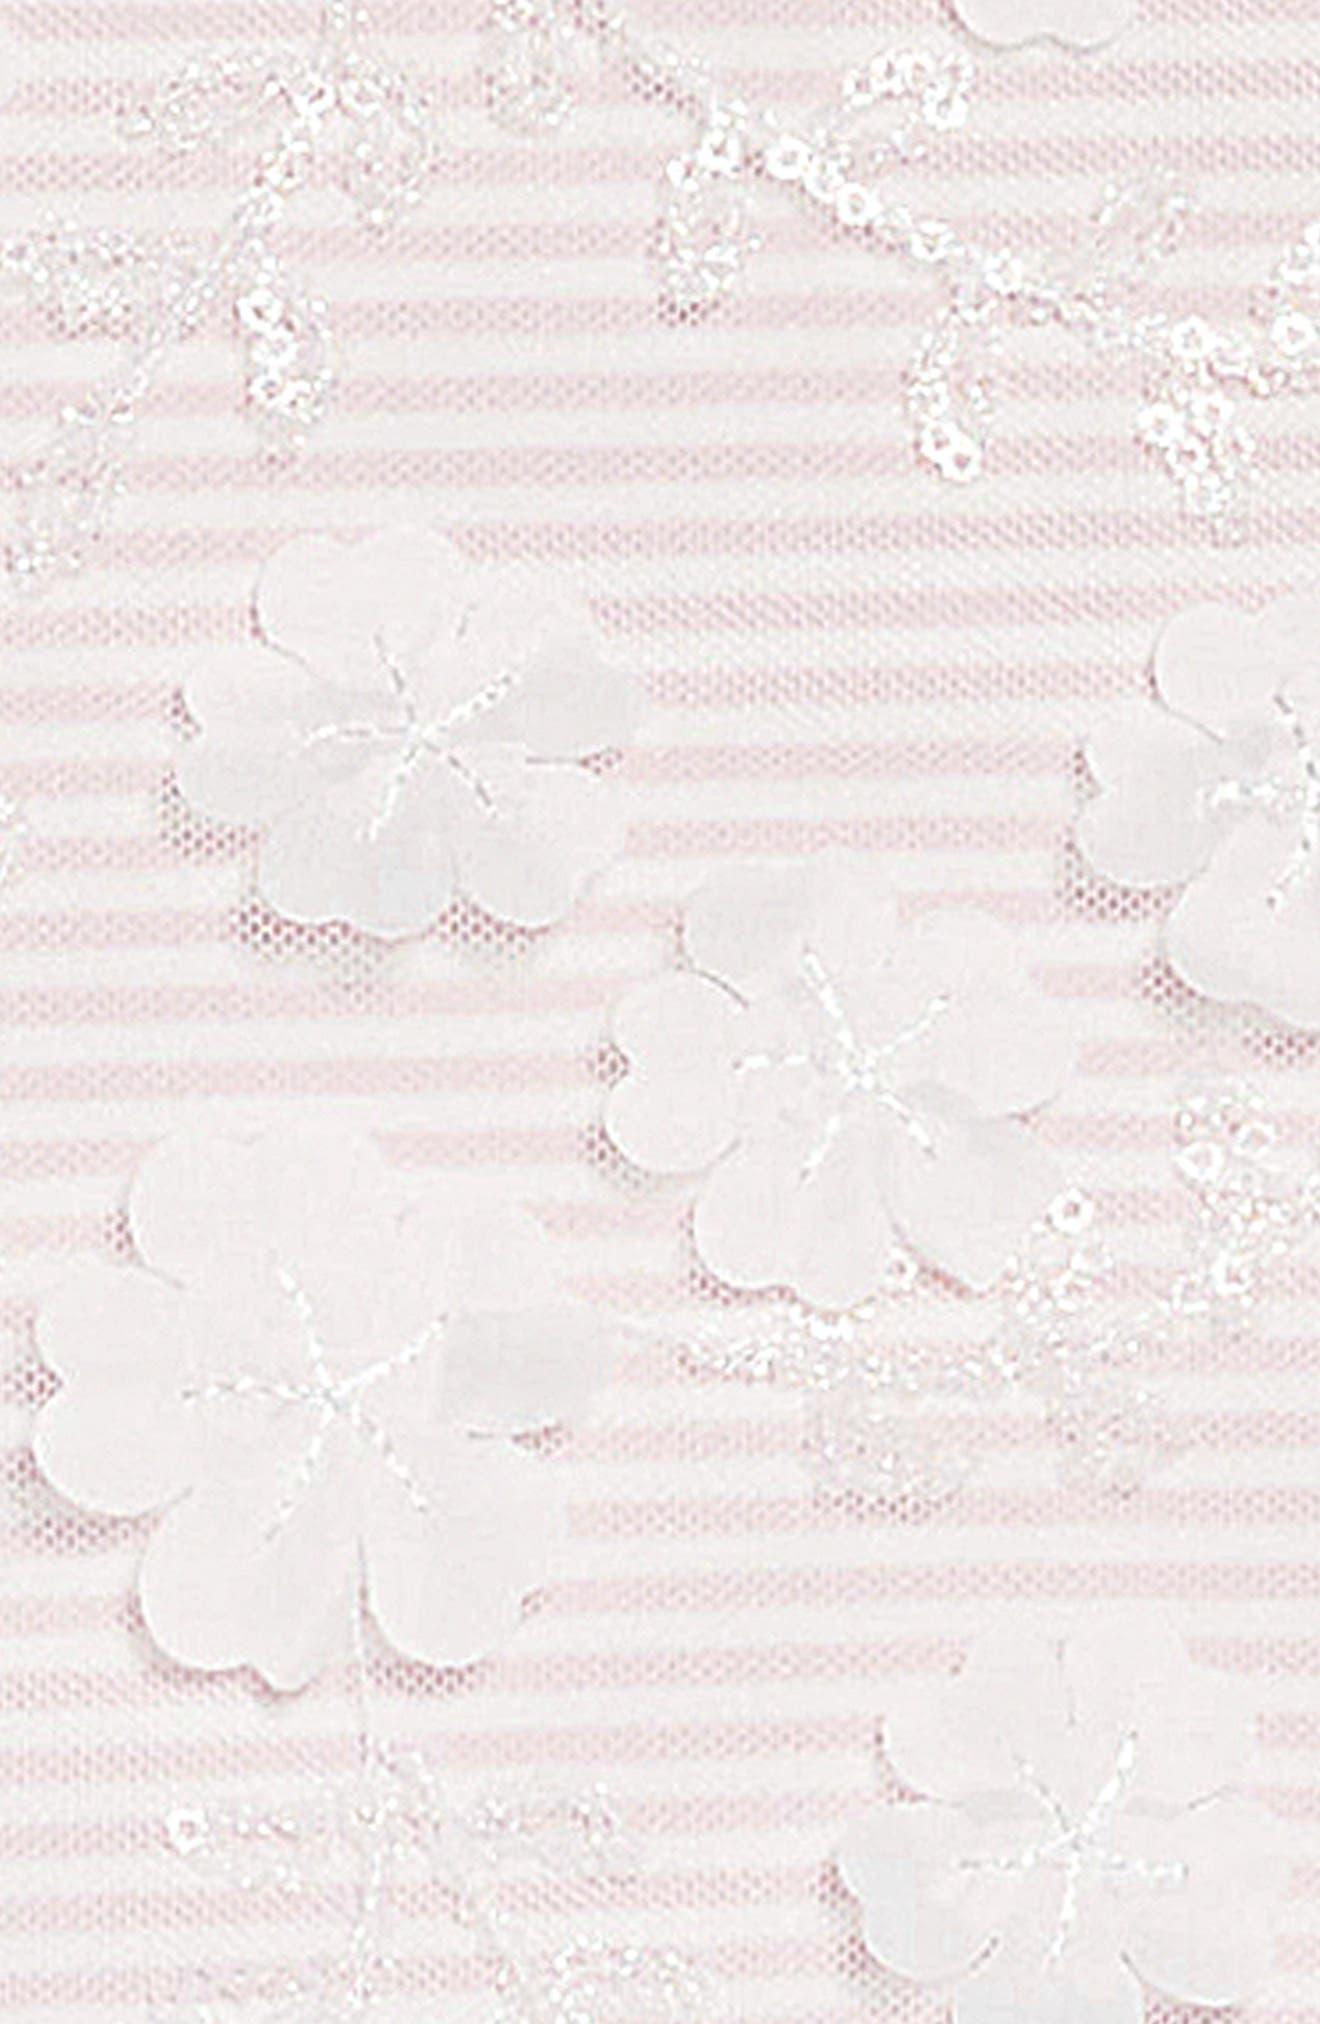 Embellished Bodice Dress,                             Alternate thumbnail 3, color,                             PINK/ WHITE